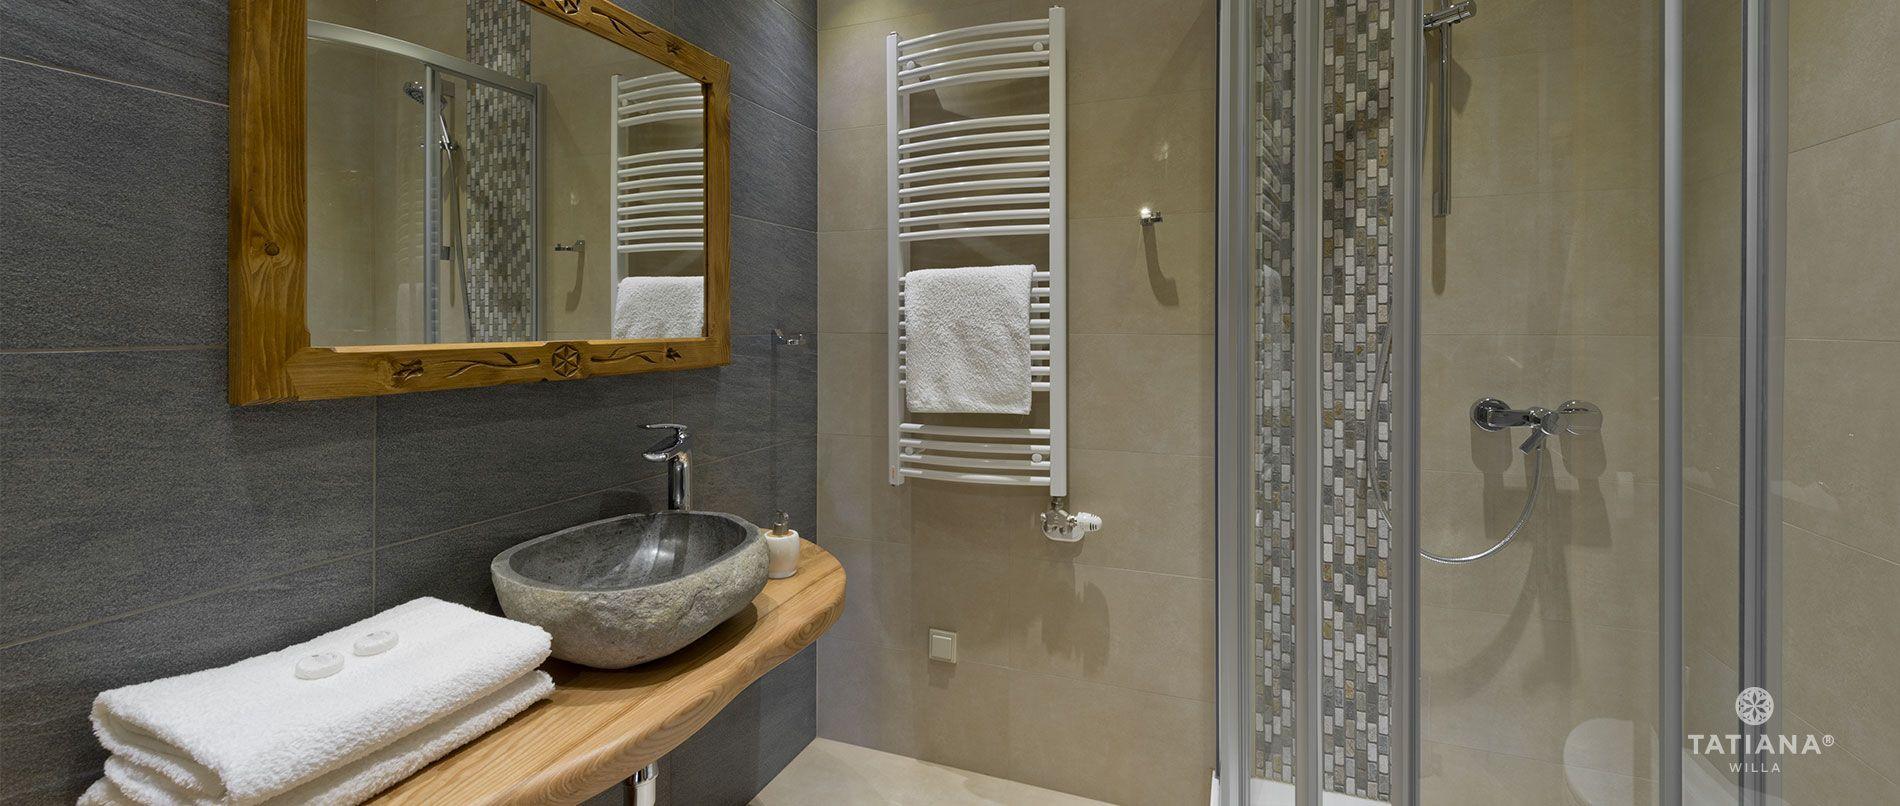 Apartament Lux 15 - druga łazienka